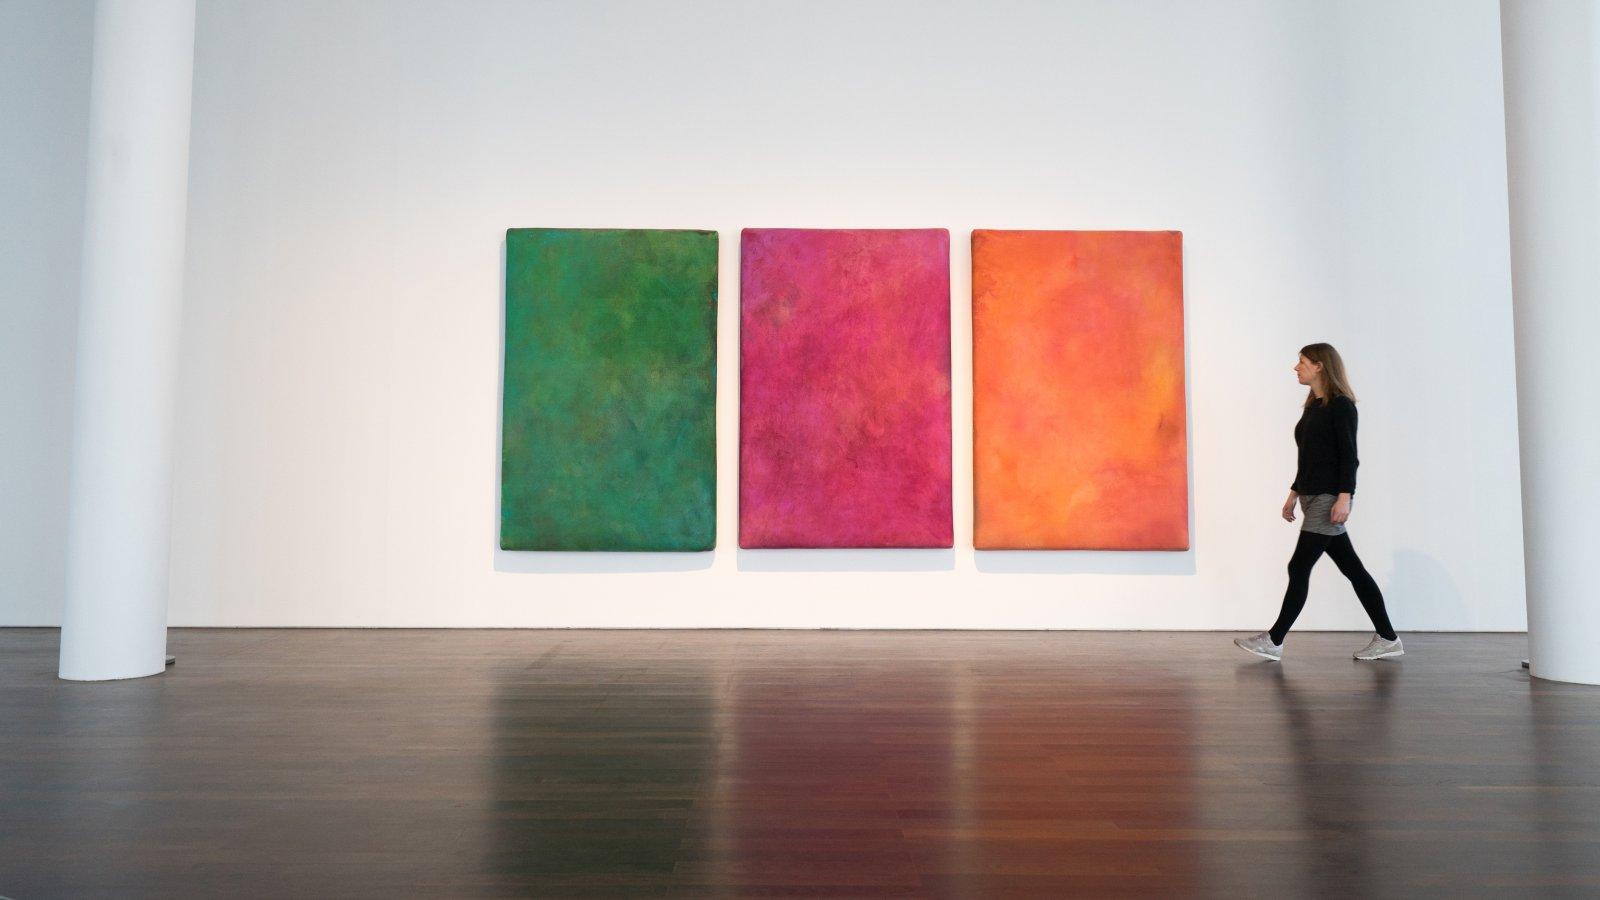 Gotthard Graubner, Venezia (Triptychon), 1982 © VG Bild-Kunst Bonn 2018, Museum für Moderne Kunst Frankfurt am Main, Foto: Dr. Thomas Köster